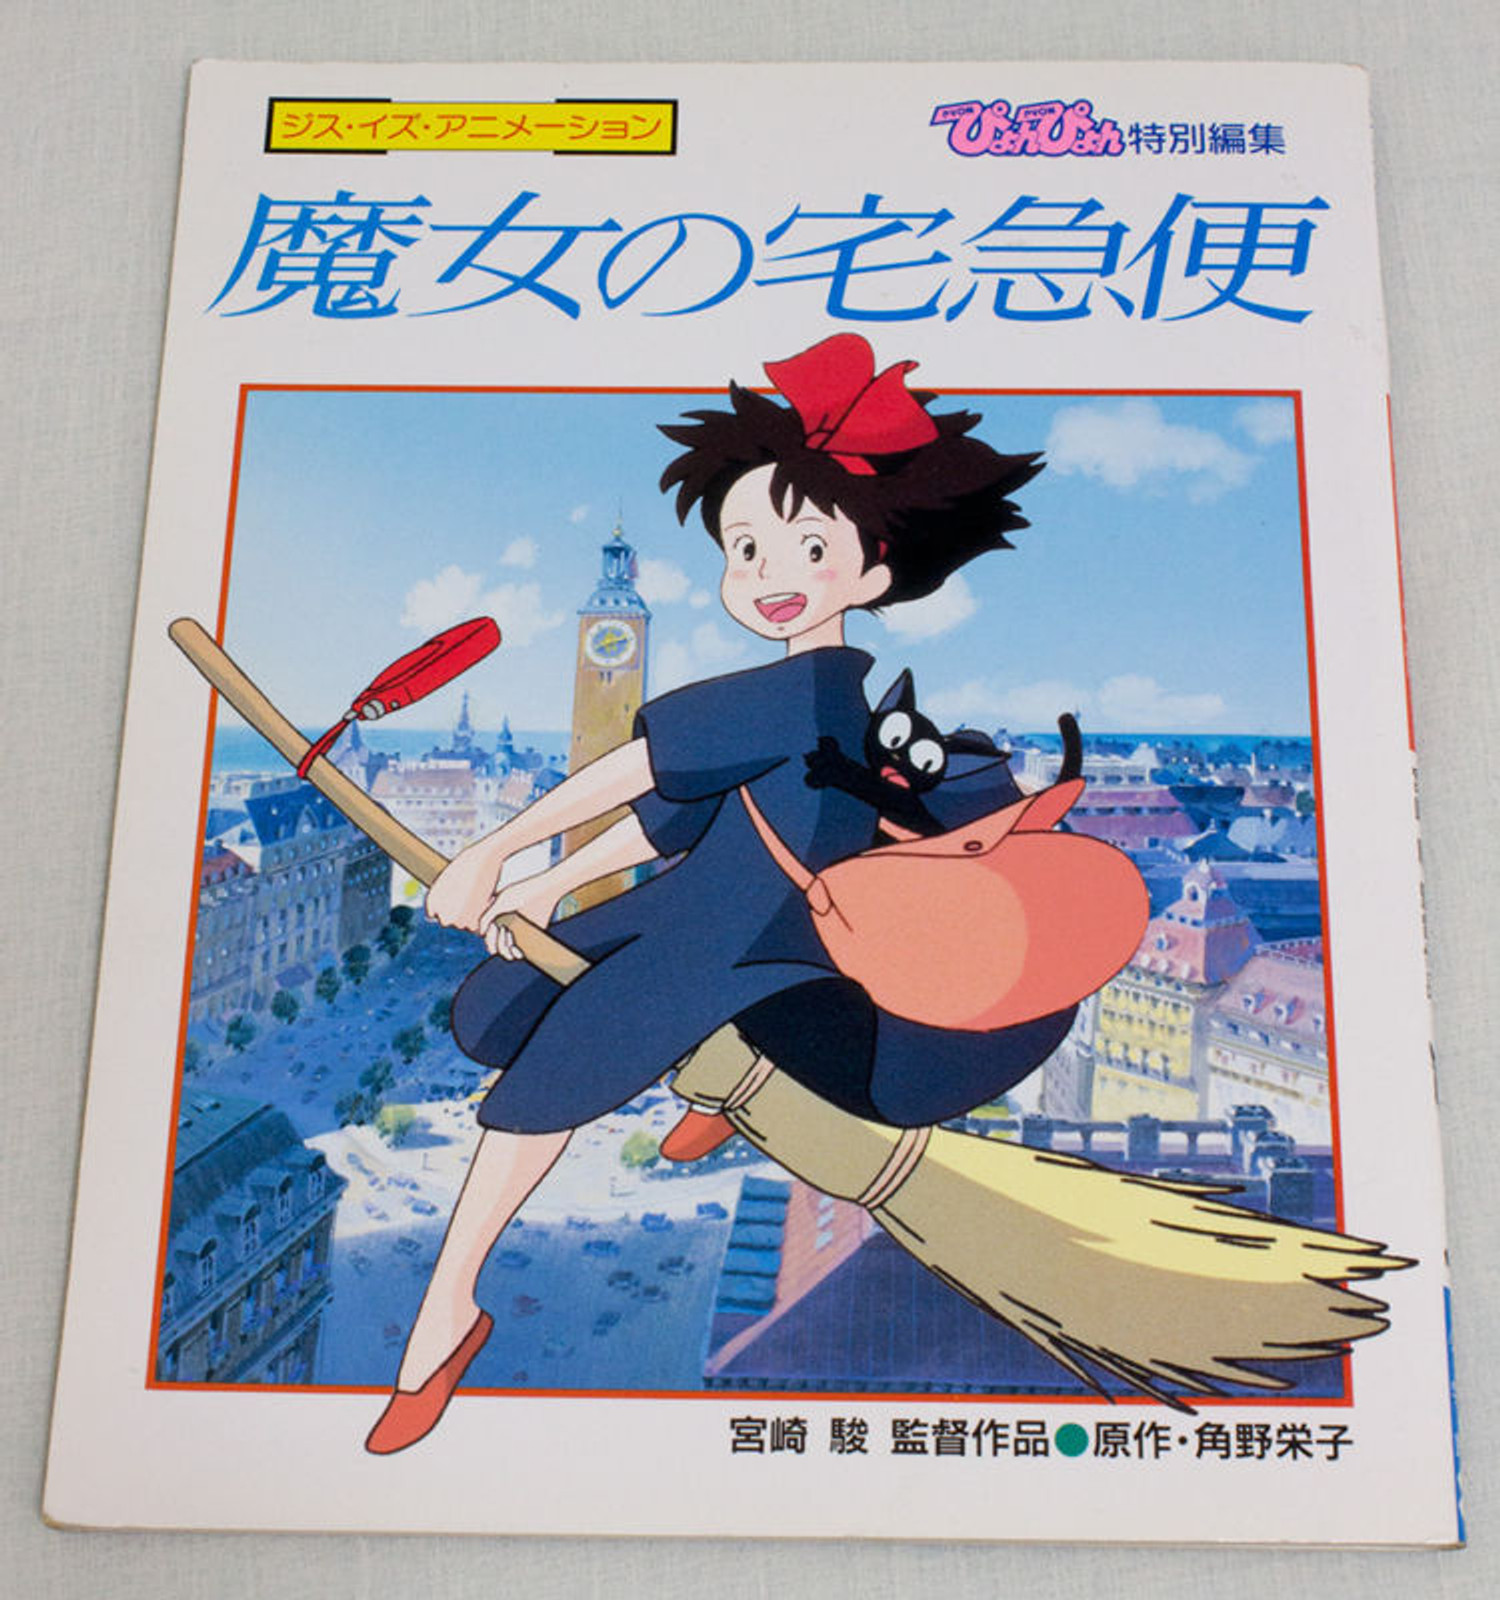 Kiki's Delivery Service Japanese Film Comic Book Ghibli JAPAN ANIME MANGA